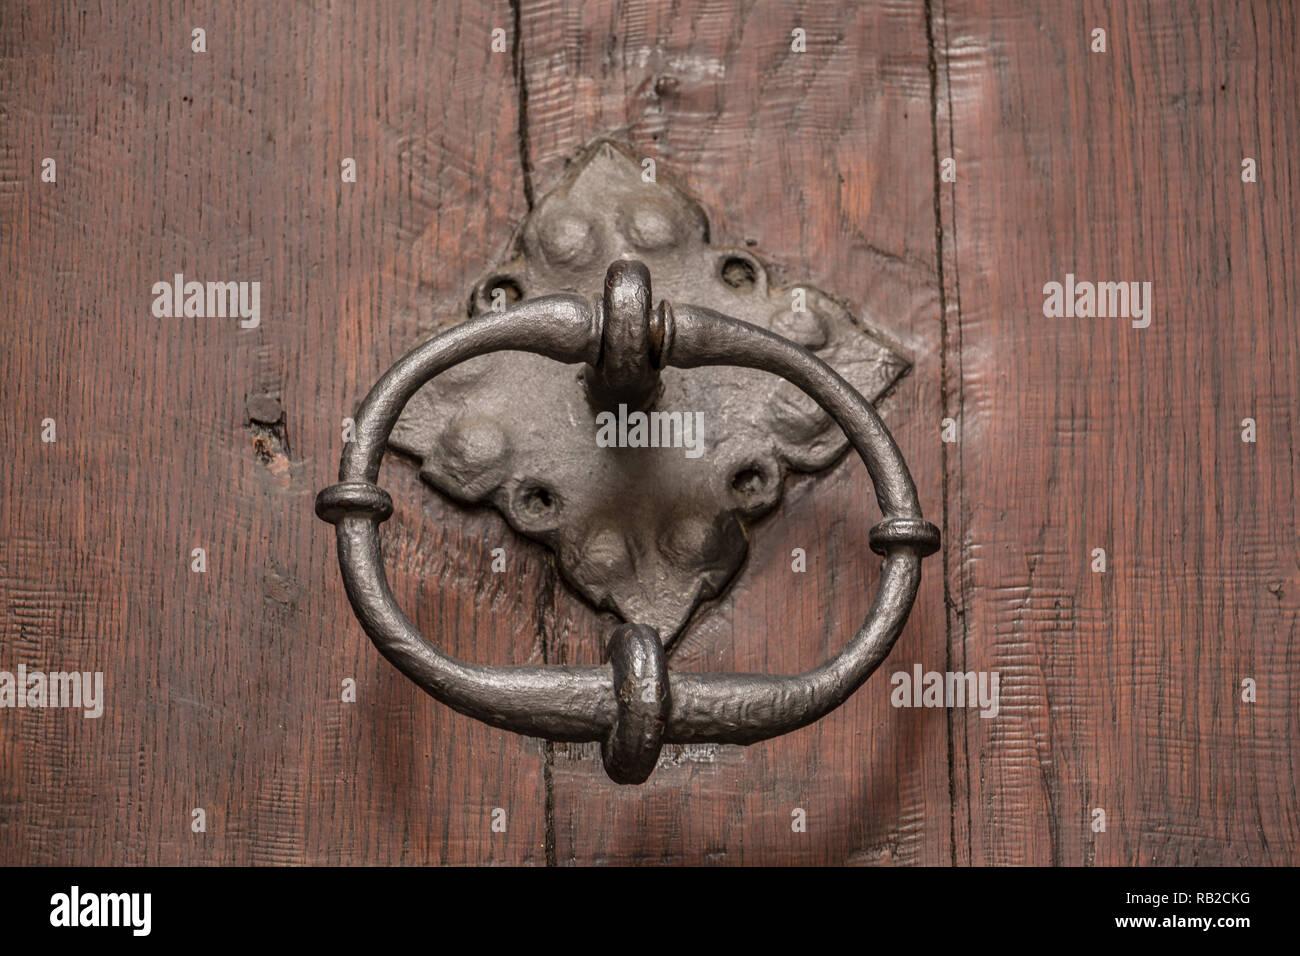 Old door of a historical building with iron door knob - Stock Image